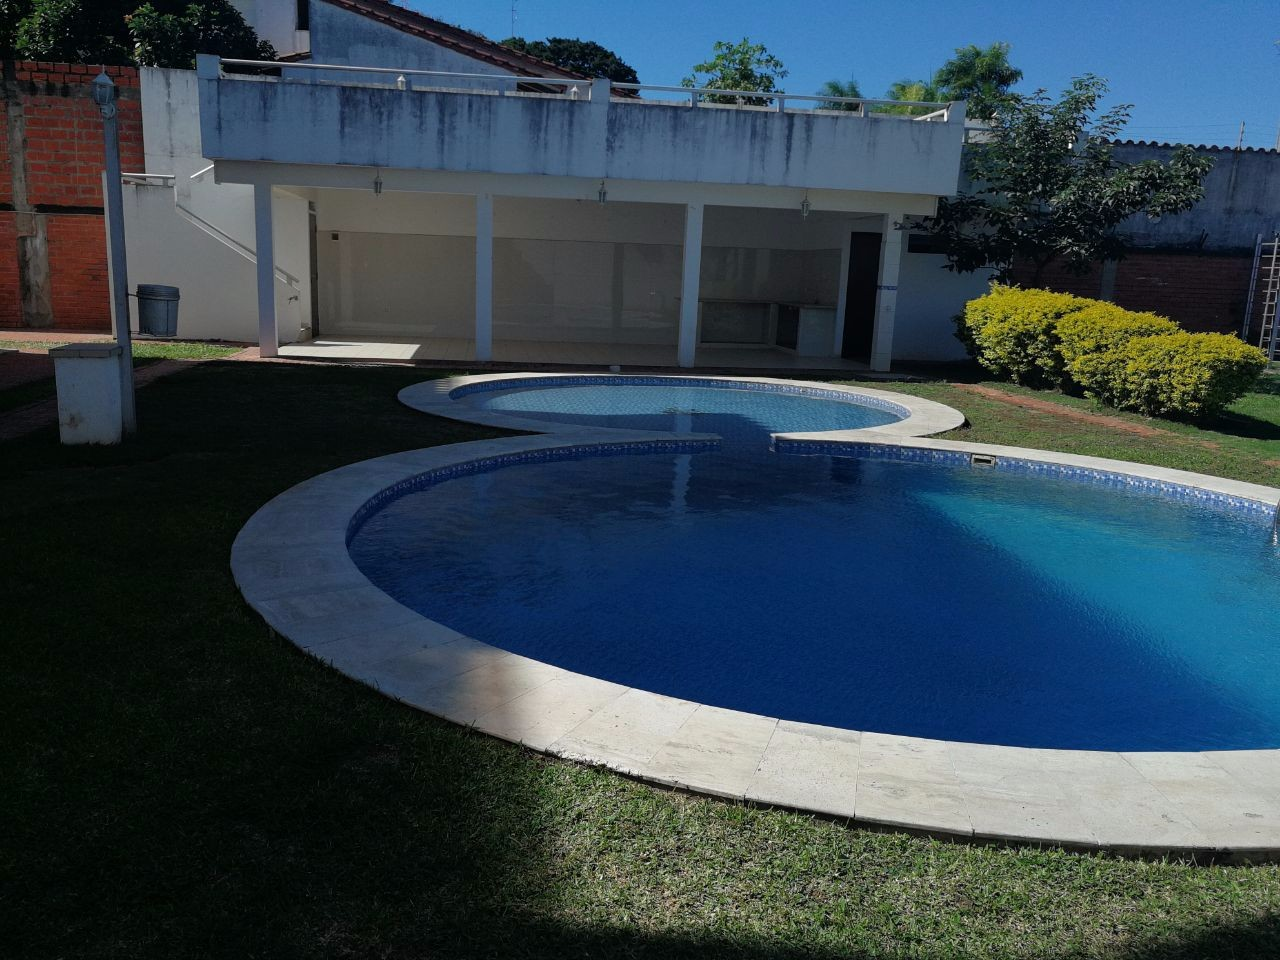 Casa en Alquiler Zona norte; 4to anillo entre av banzer y av. Beni Foto 2